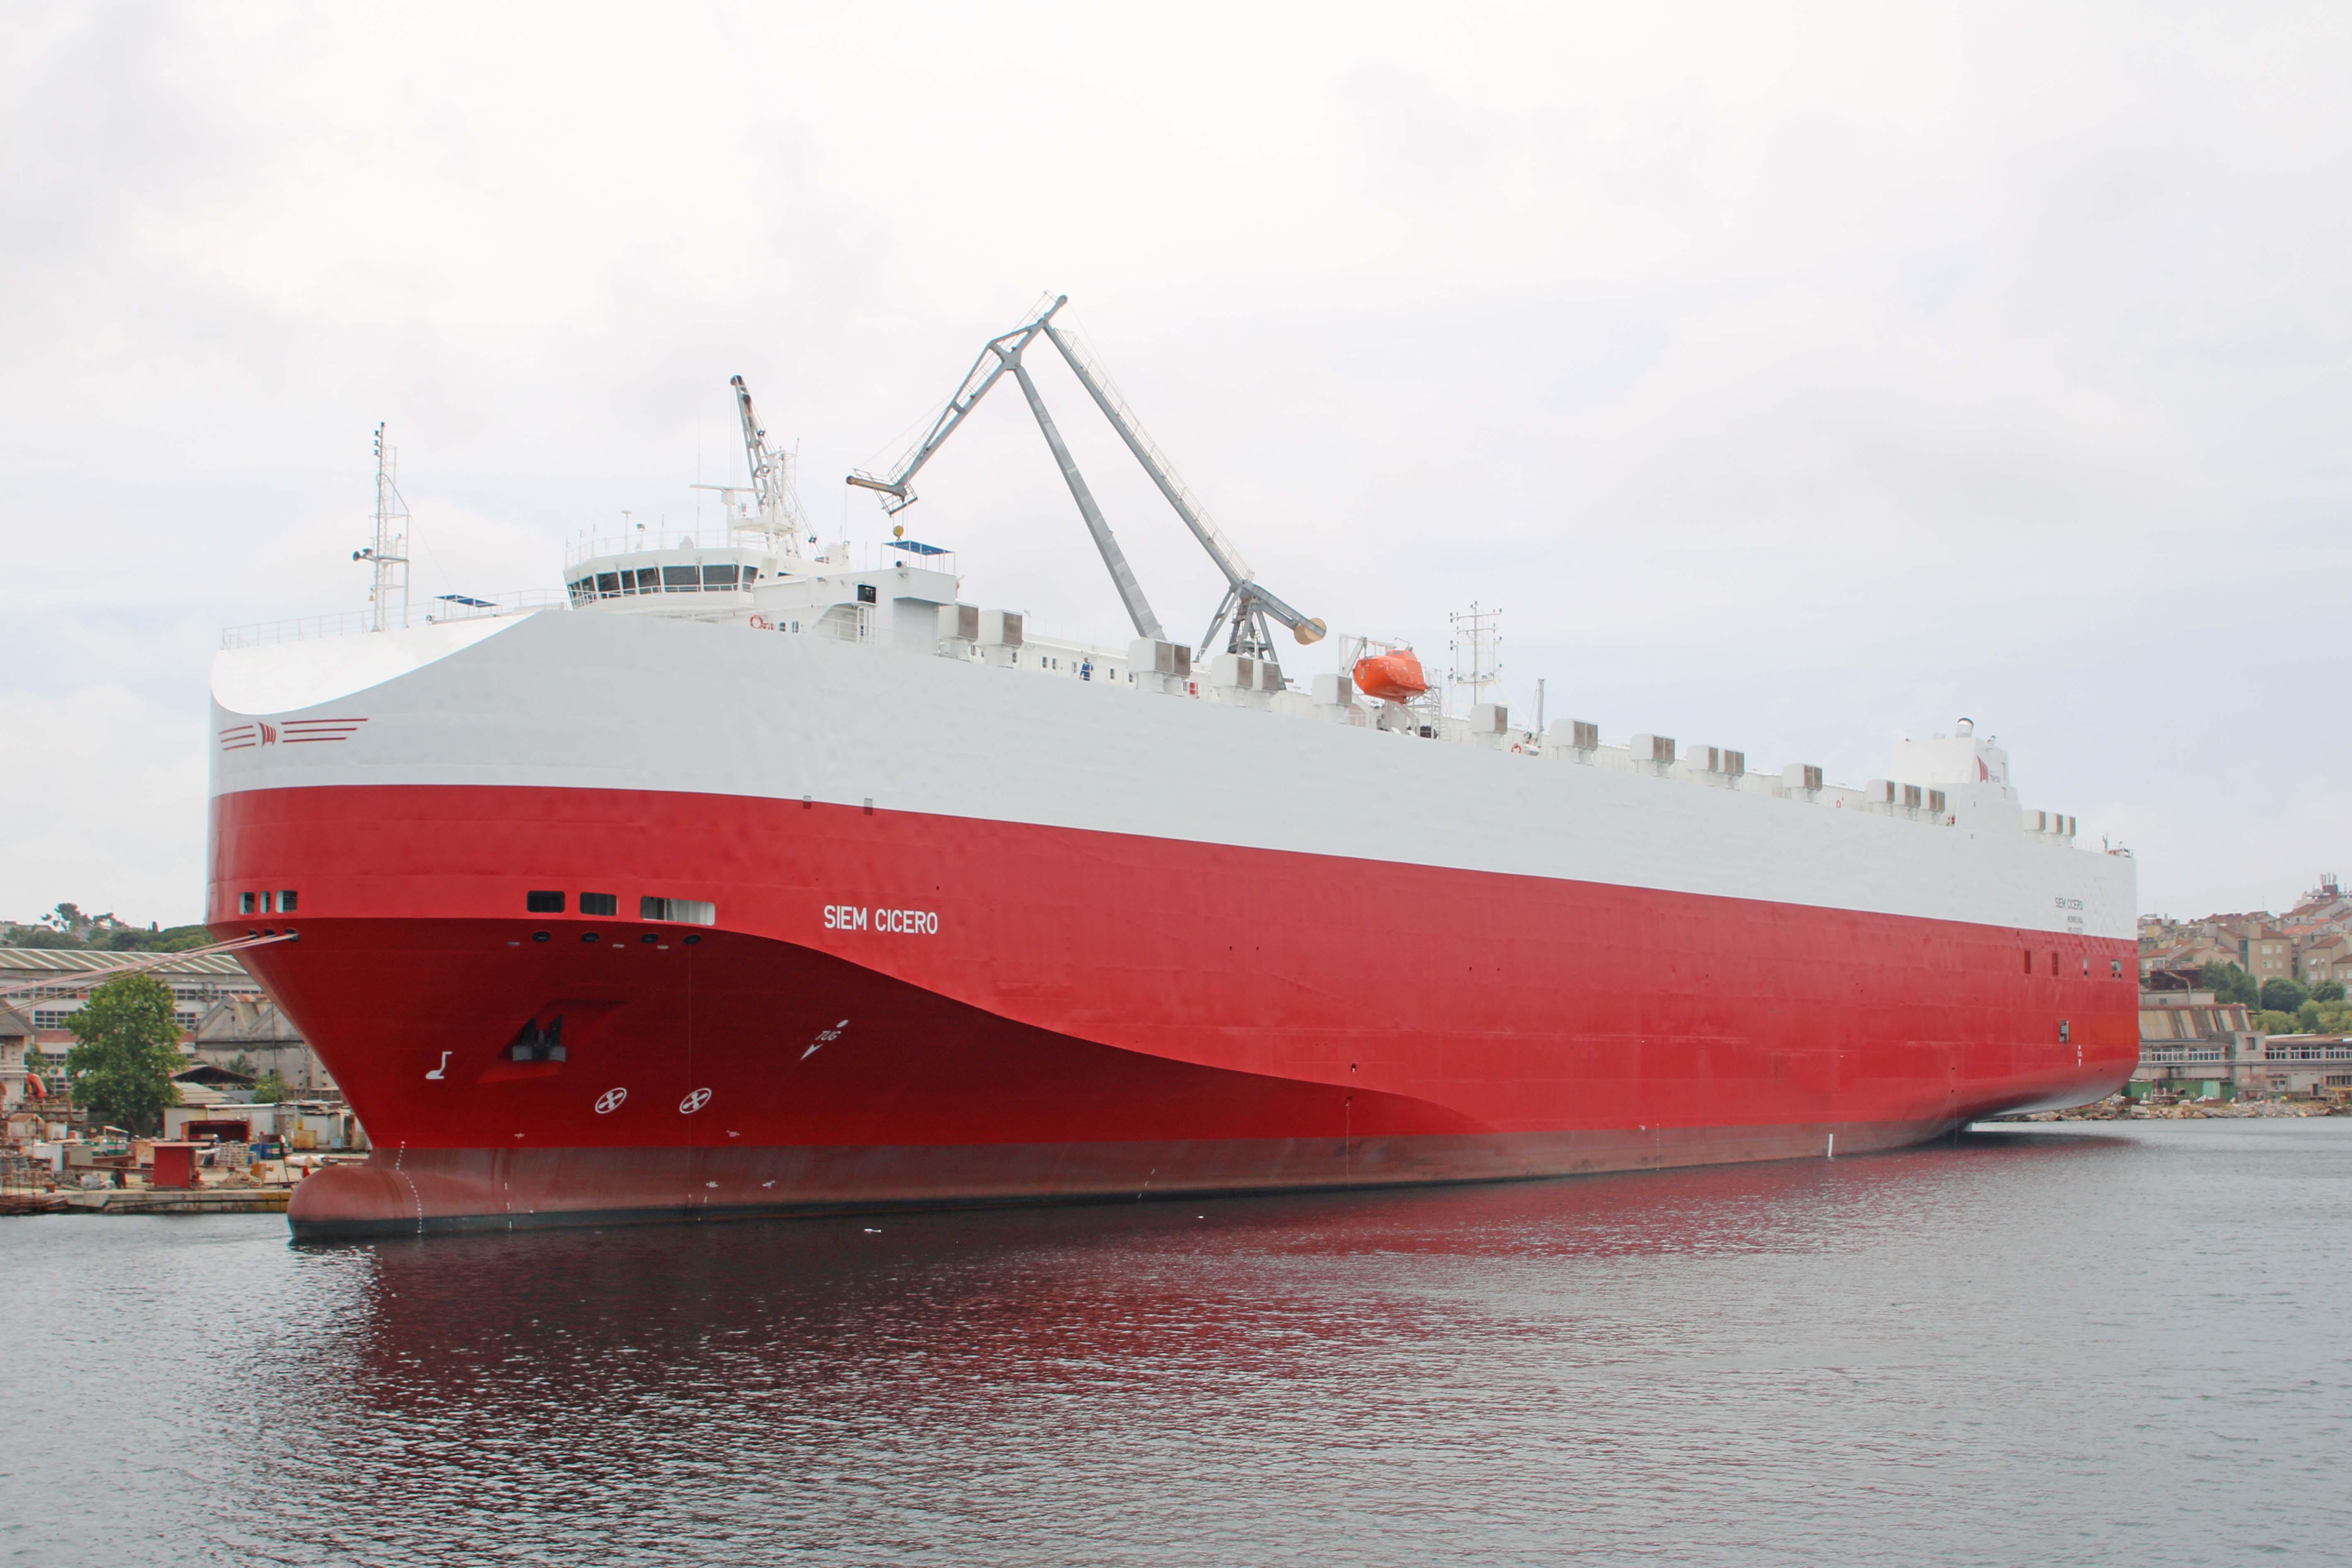 SIEM CICERO was delivered by Uljanik Shipyard in 2017